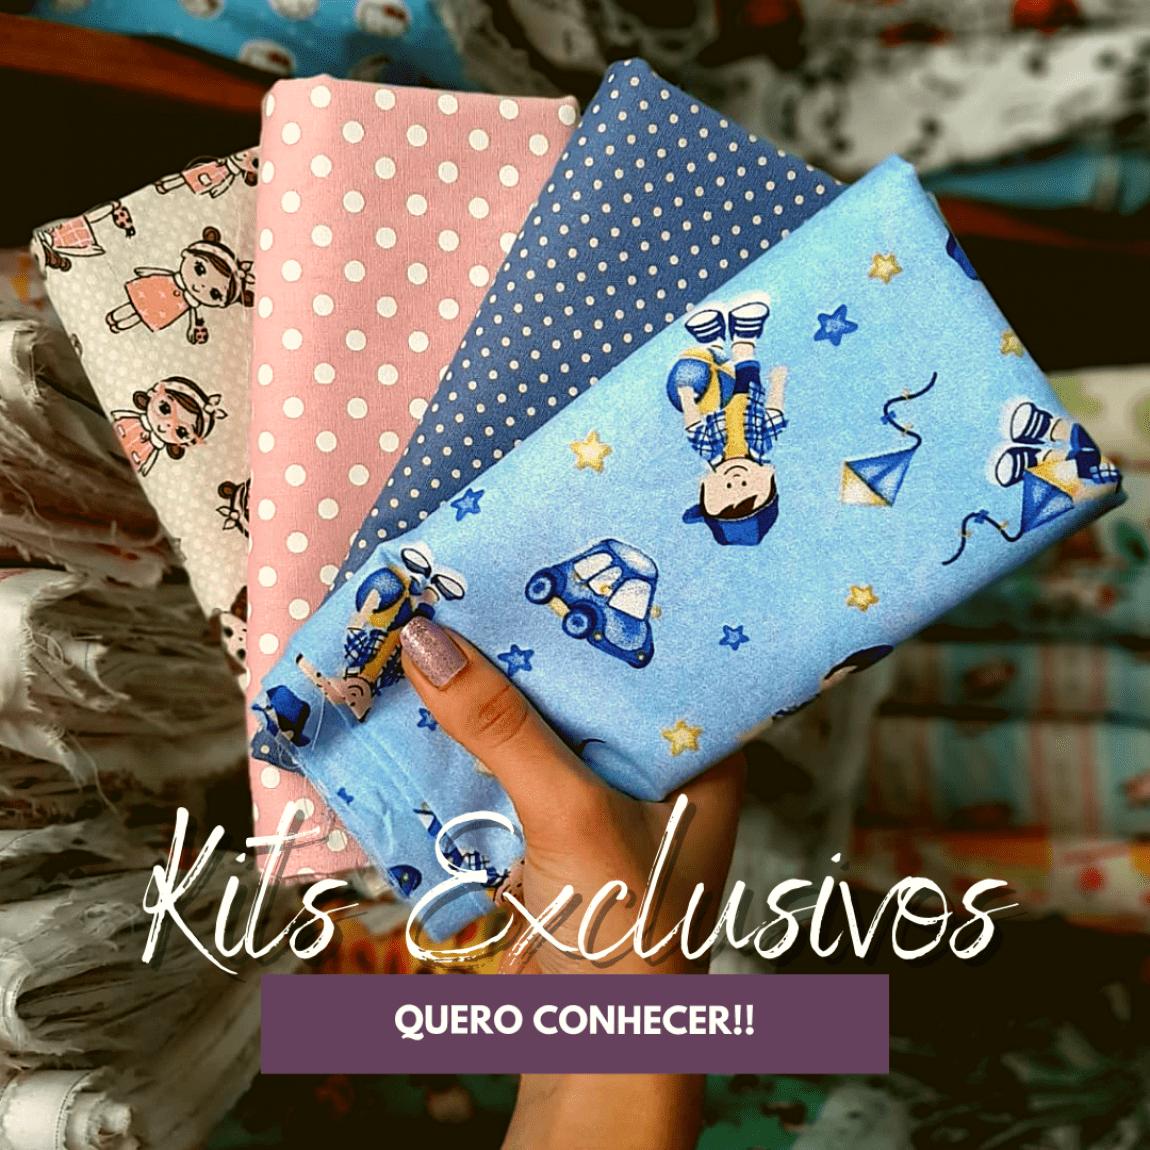 Kits Exclusivos